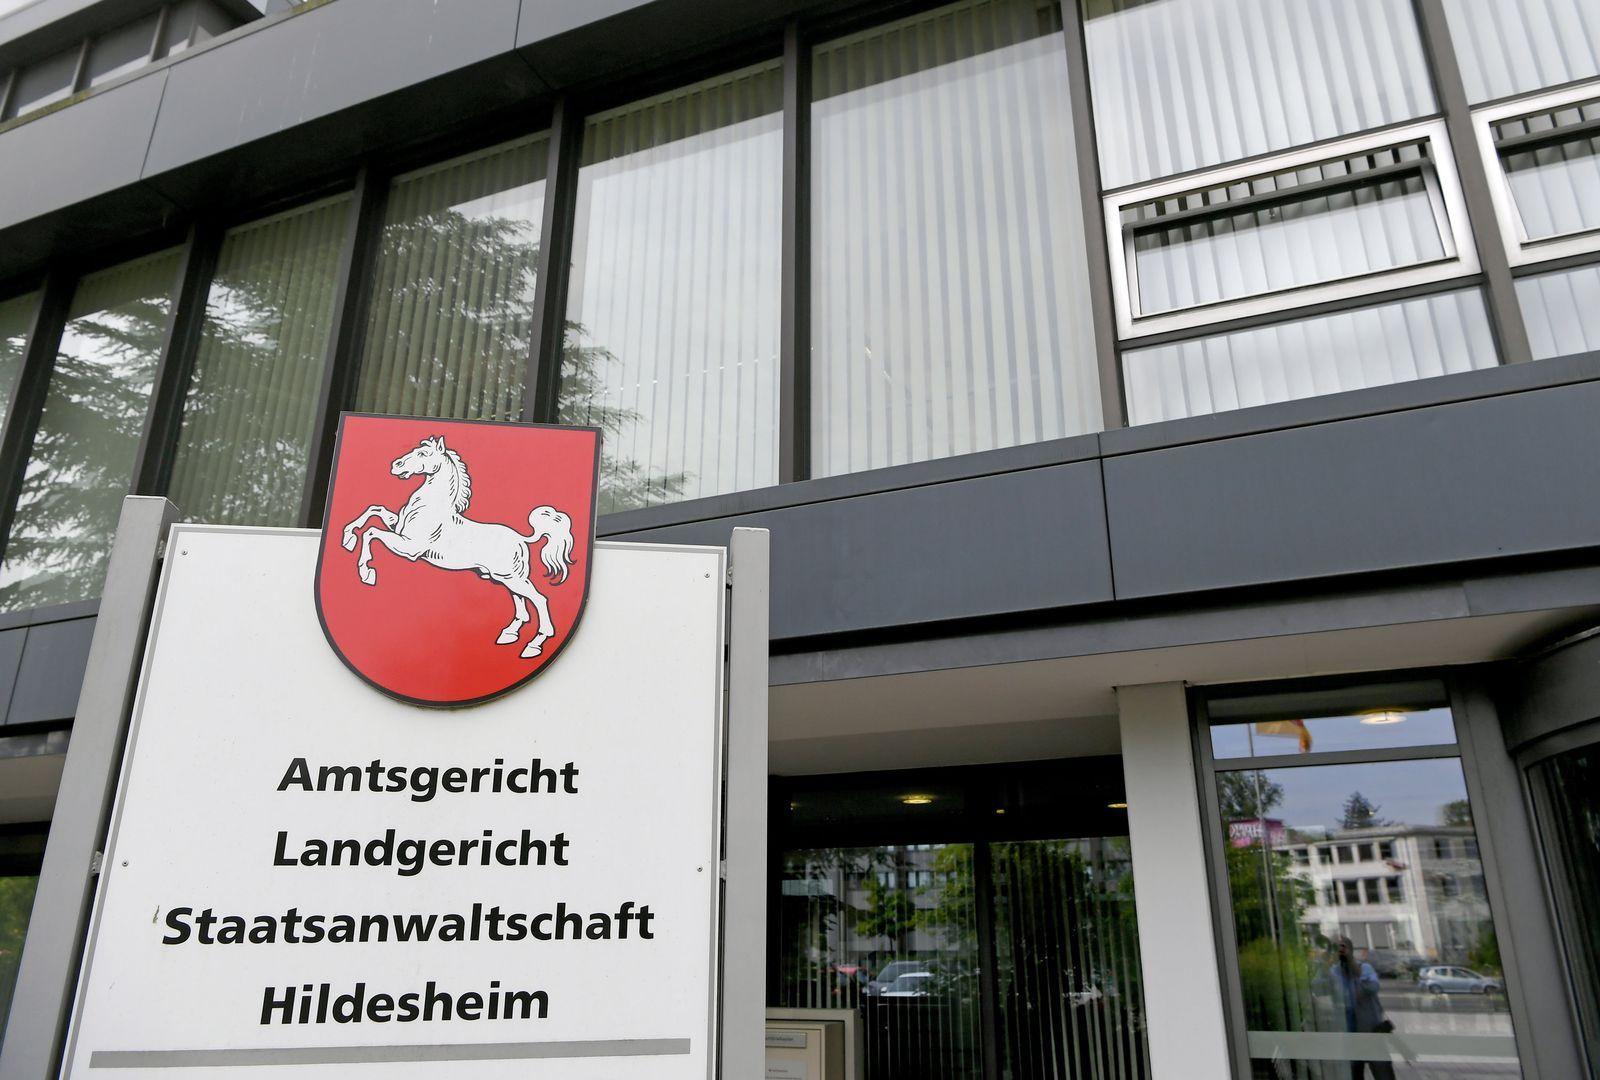 Staatsanwaltschaft Hildesheim